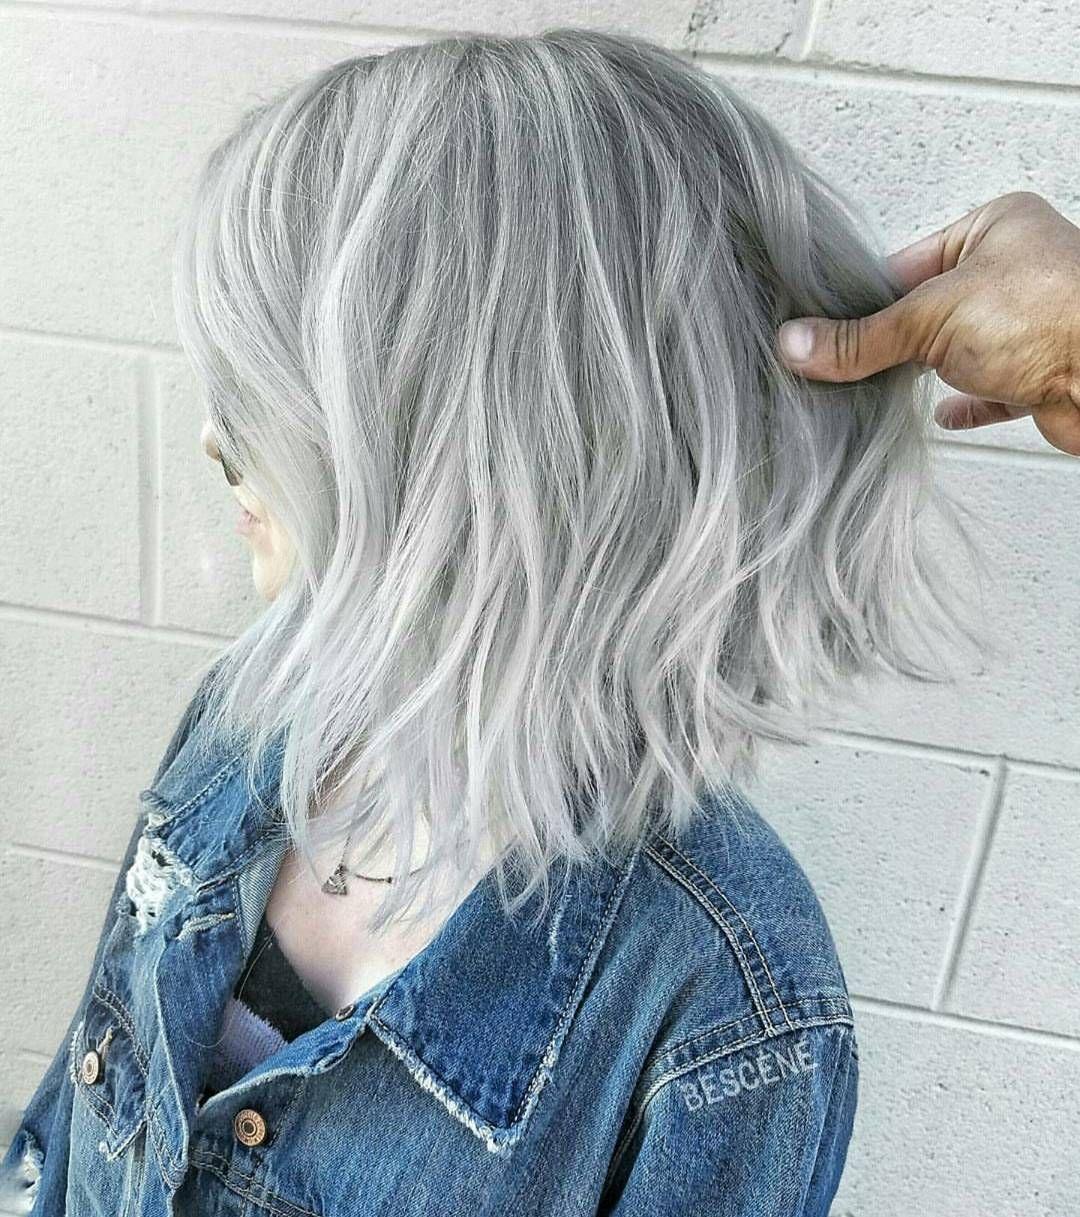 Bones bonesspanekk ucium a silver fox now ud  Hair  Pinterest